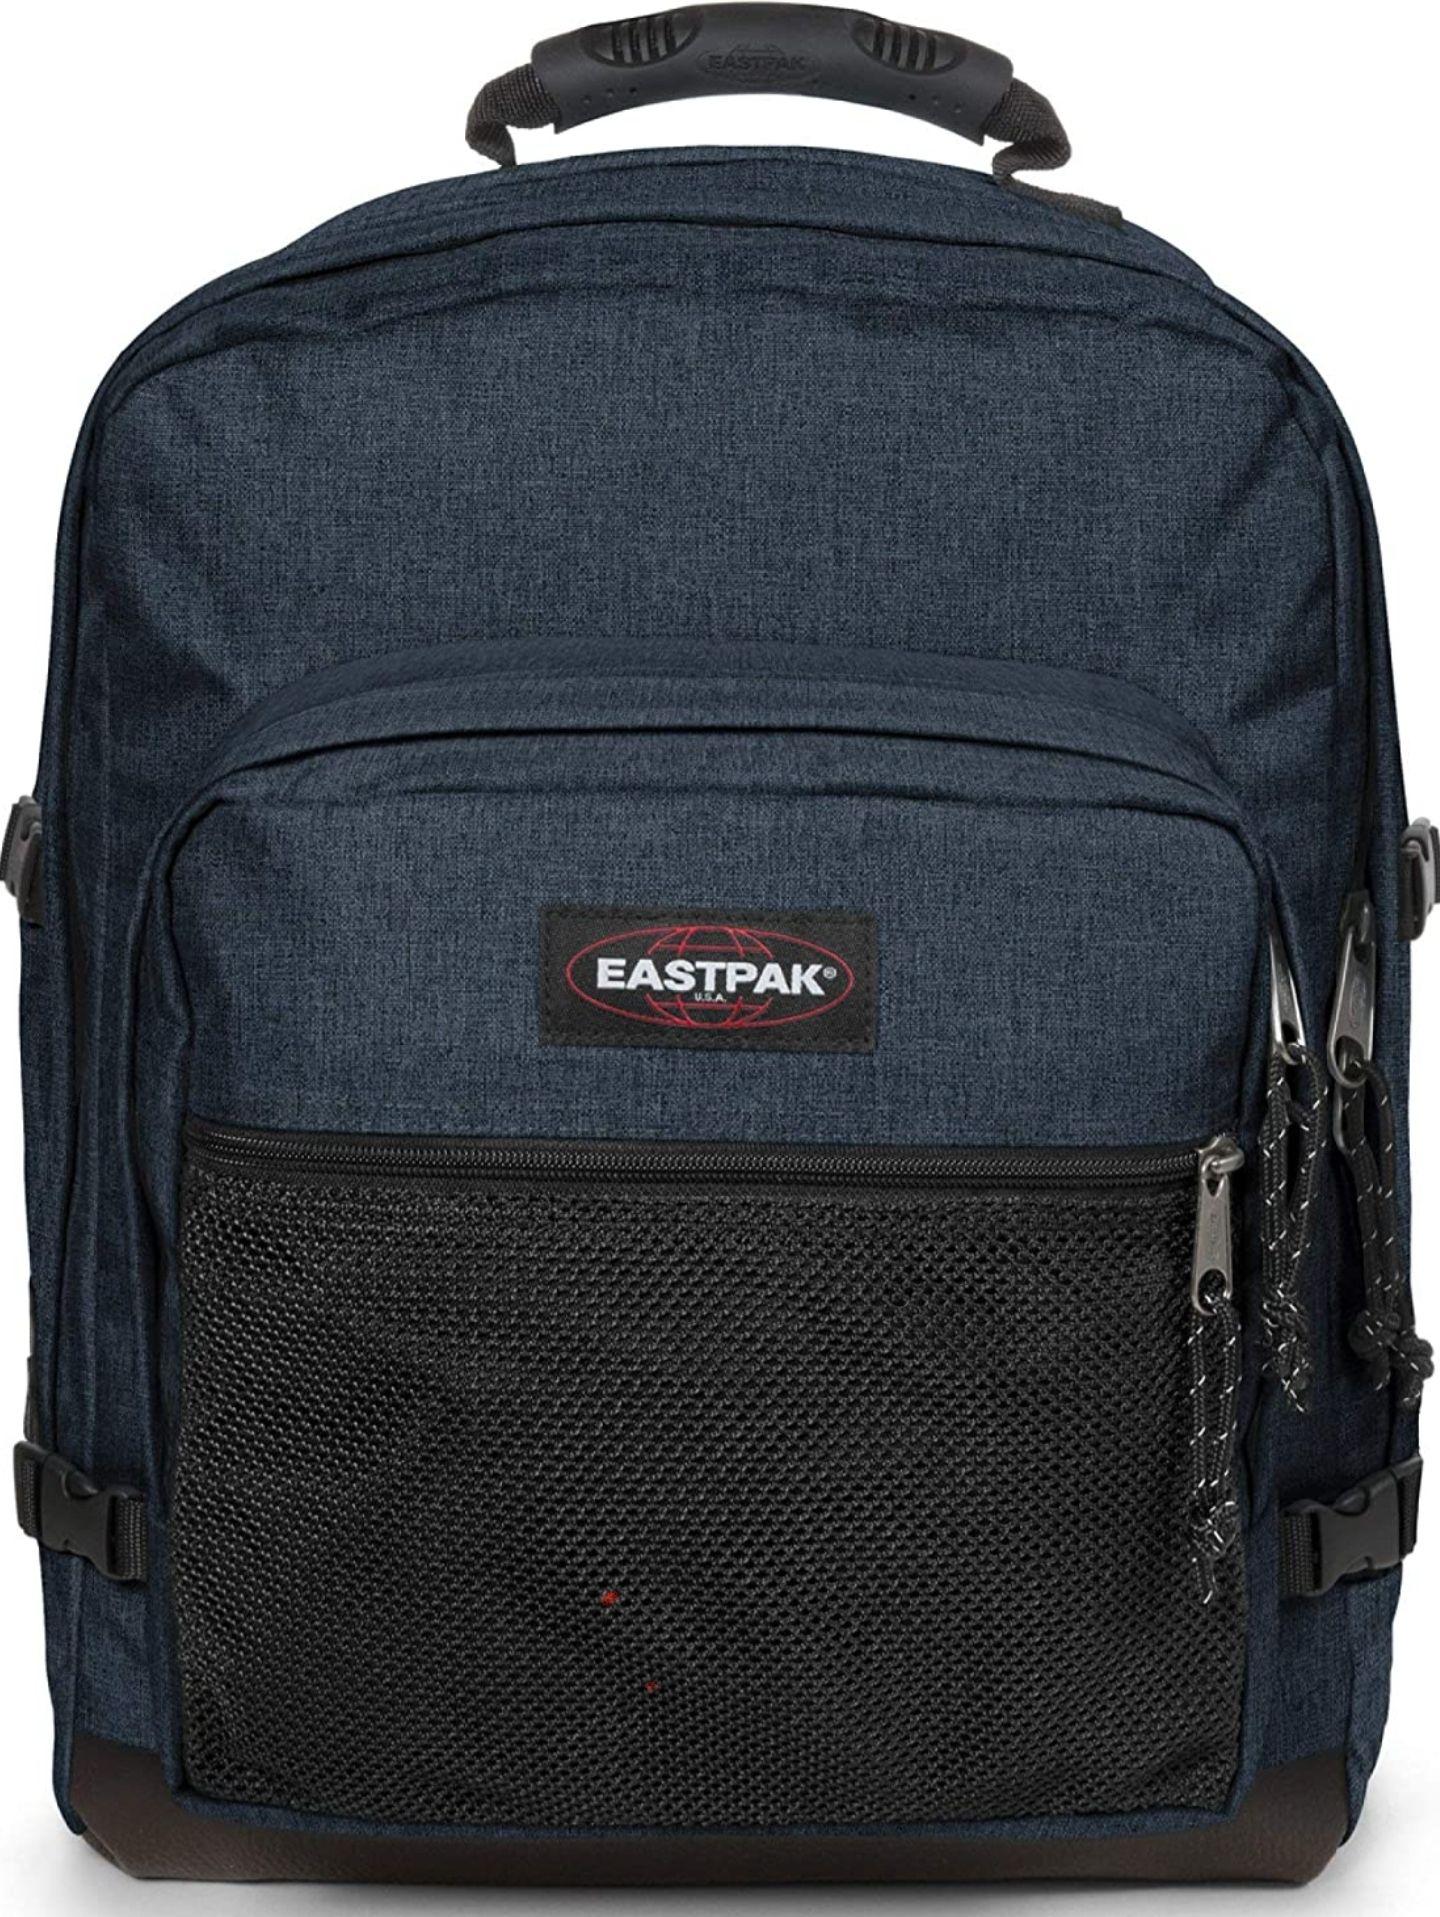 Eastpak Ultimate Backpack, 42 cm, 42 L, Blue (Triple Denim) - £37.88 @ Amazon